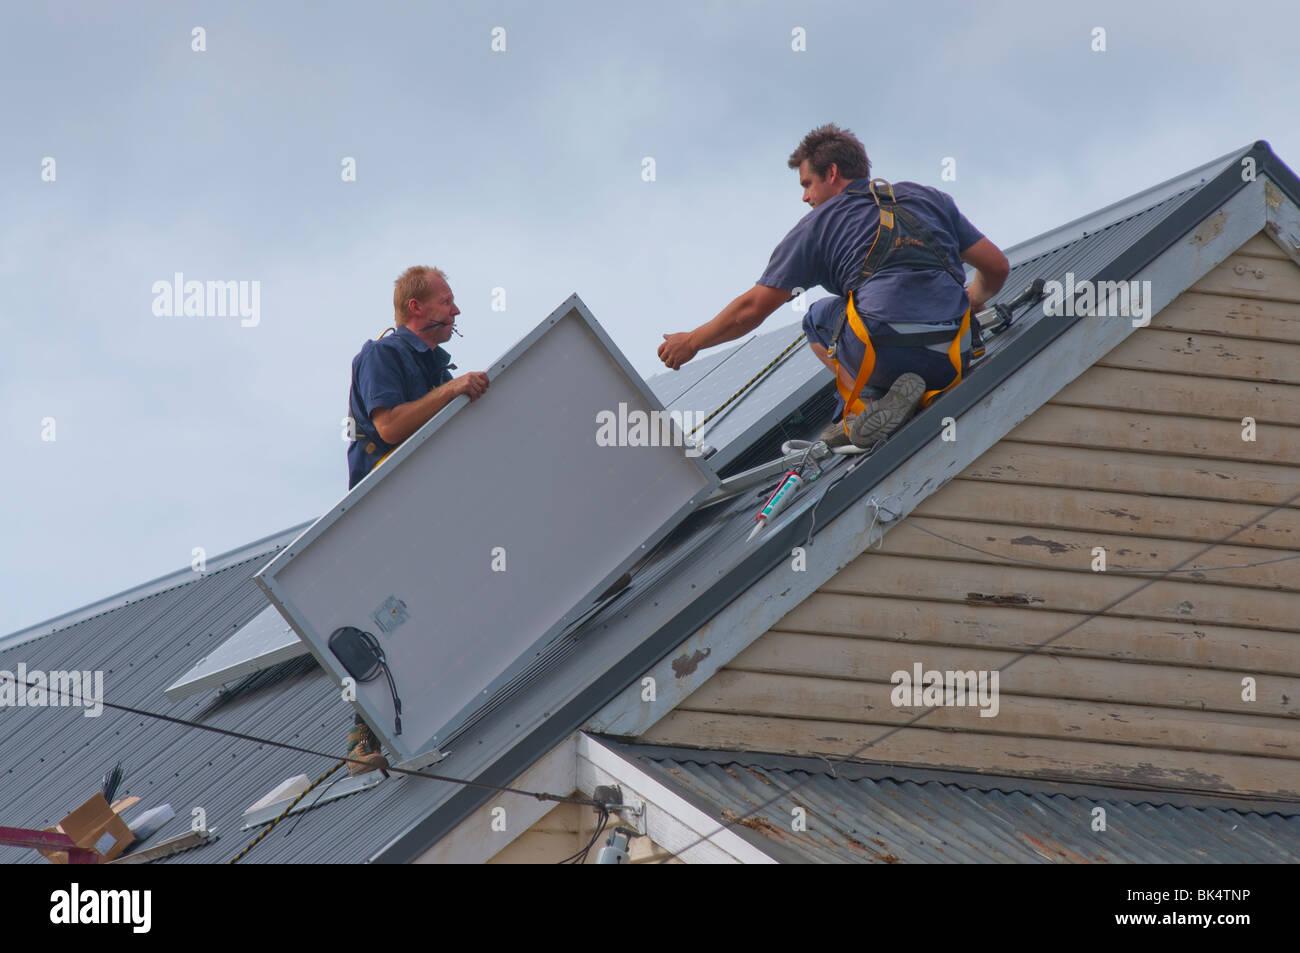 Workmen installing solar panels on roof in Hobart Tasmania Australia - Stock Image